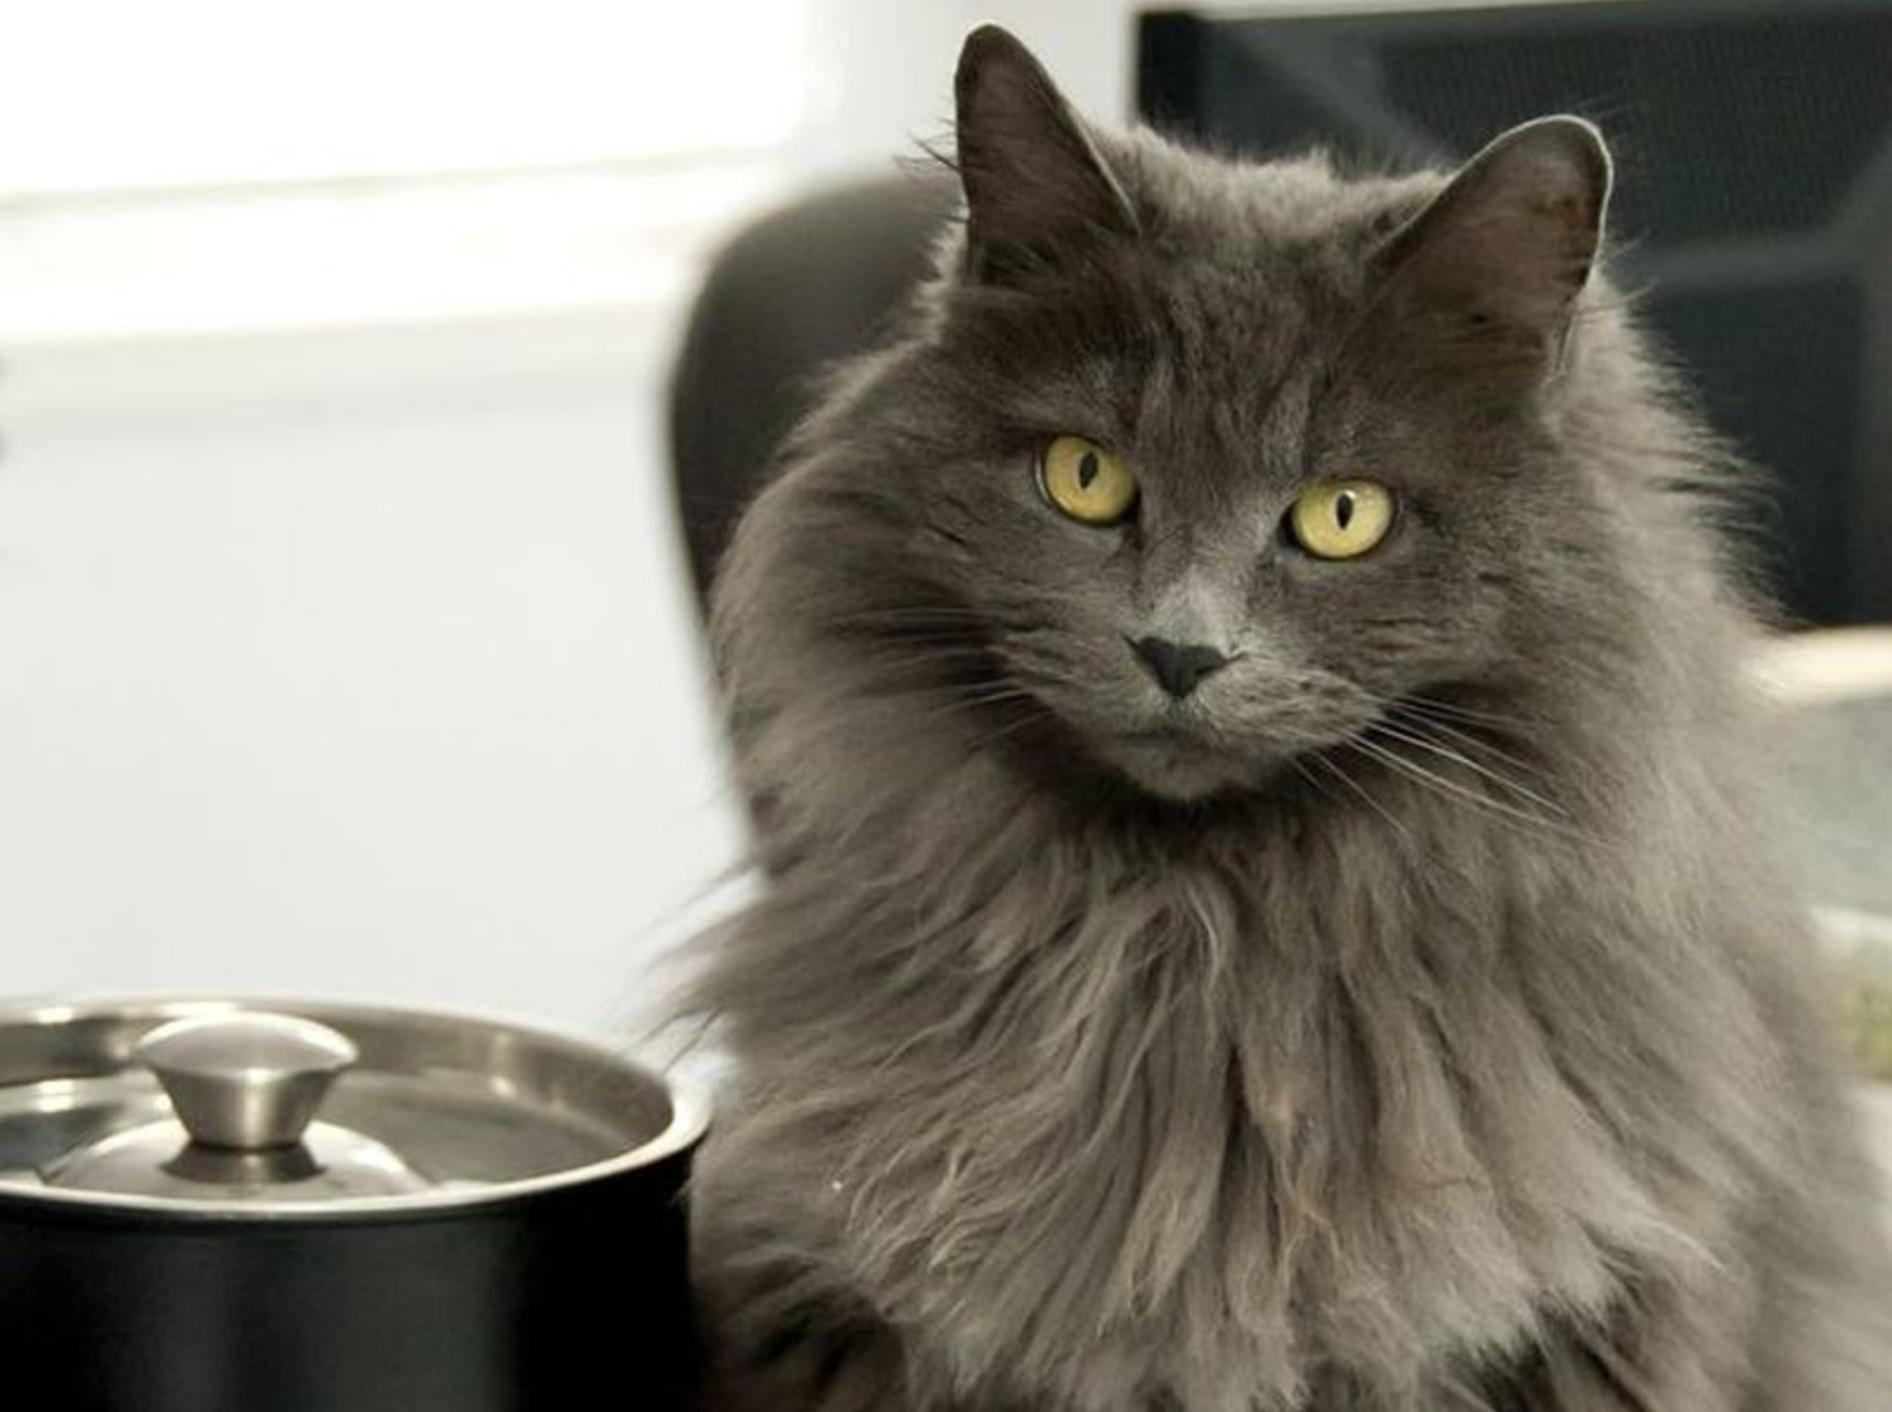 Graue Katze neben Kochtopf